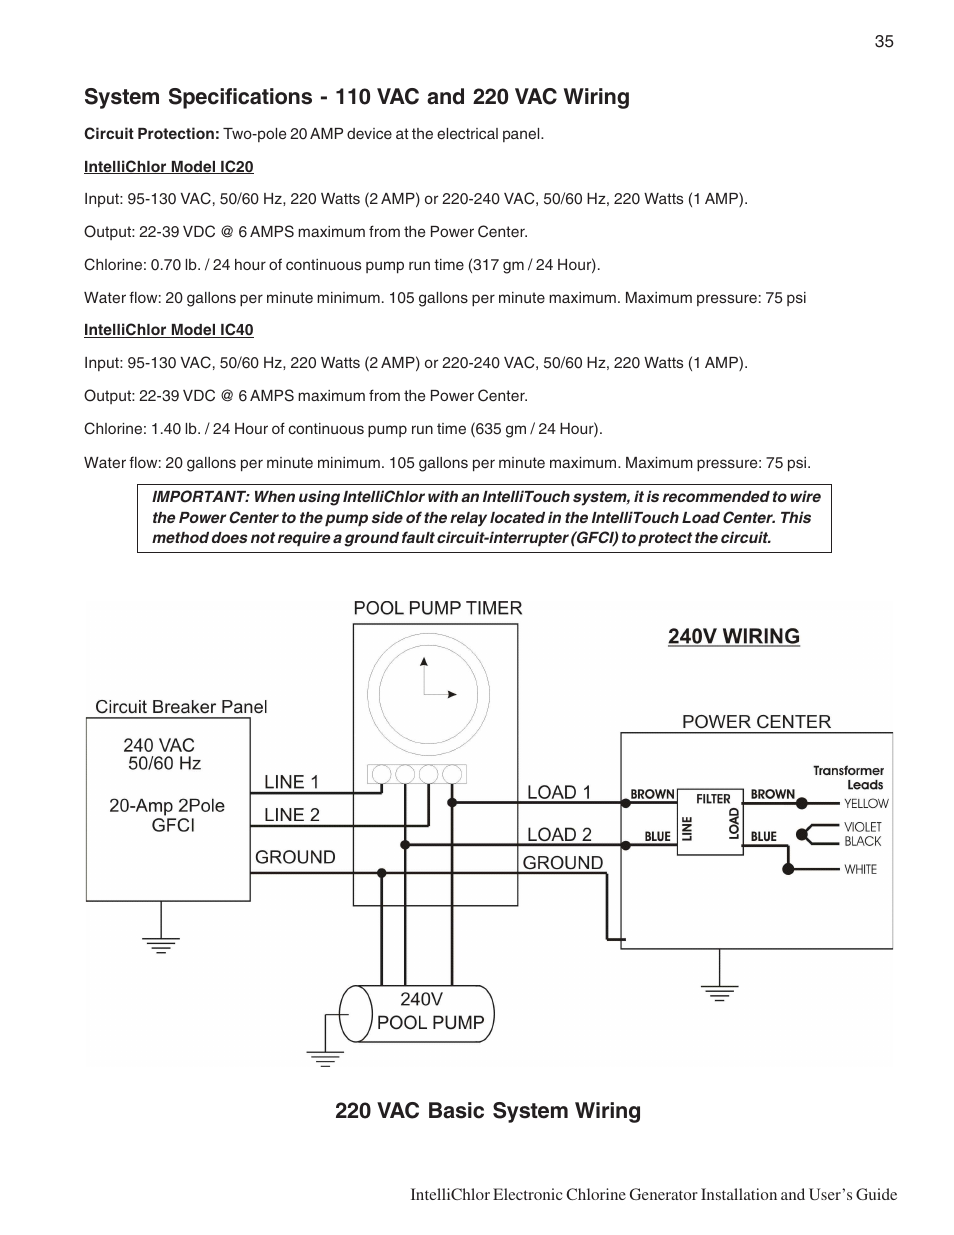 220 Vac Basic System Wiring